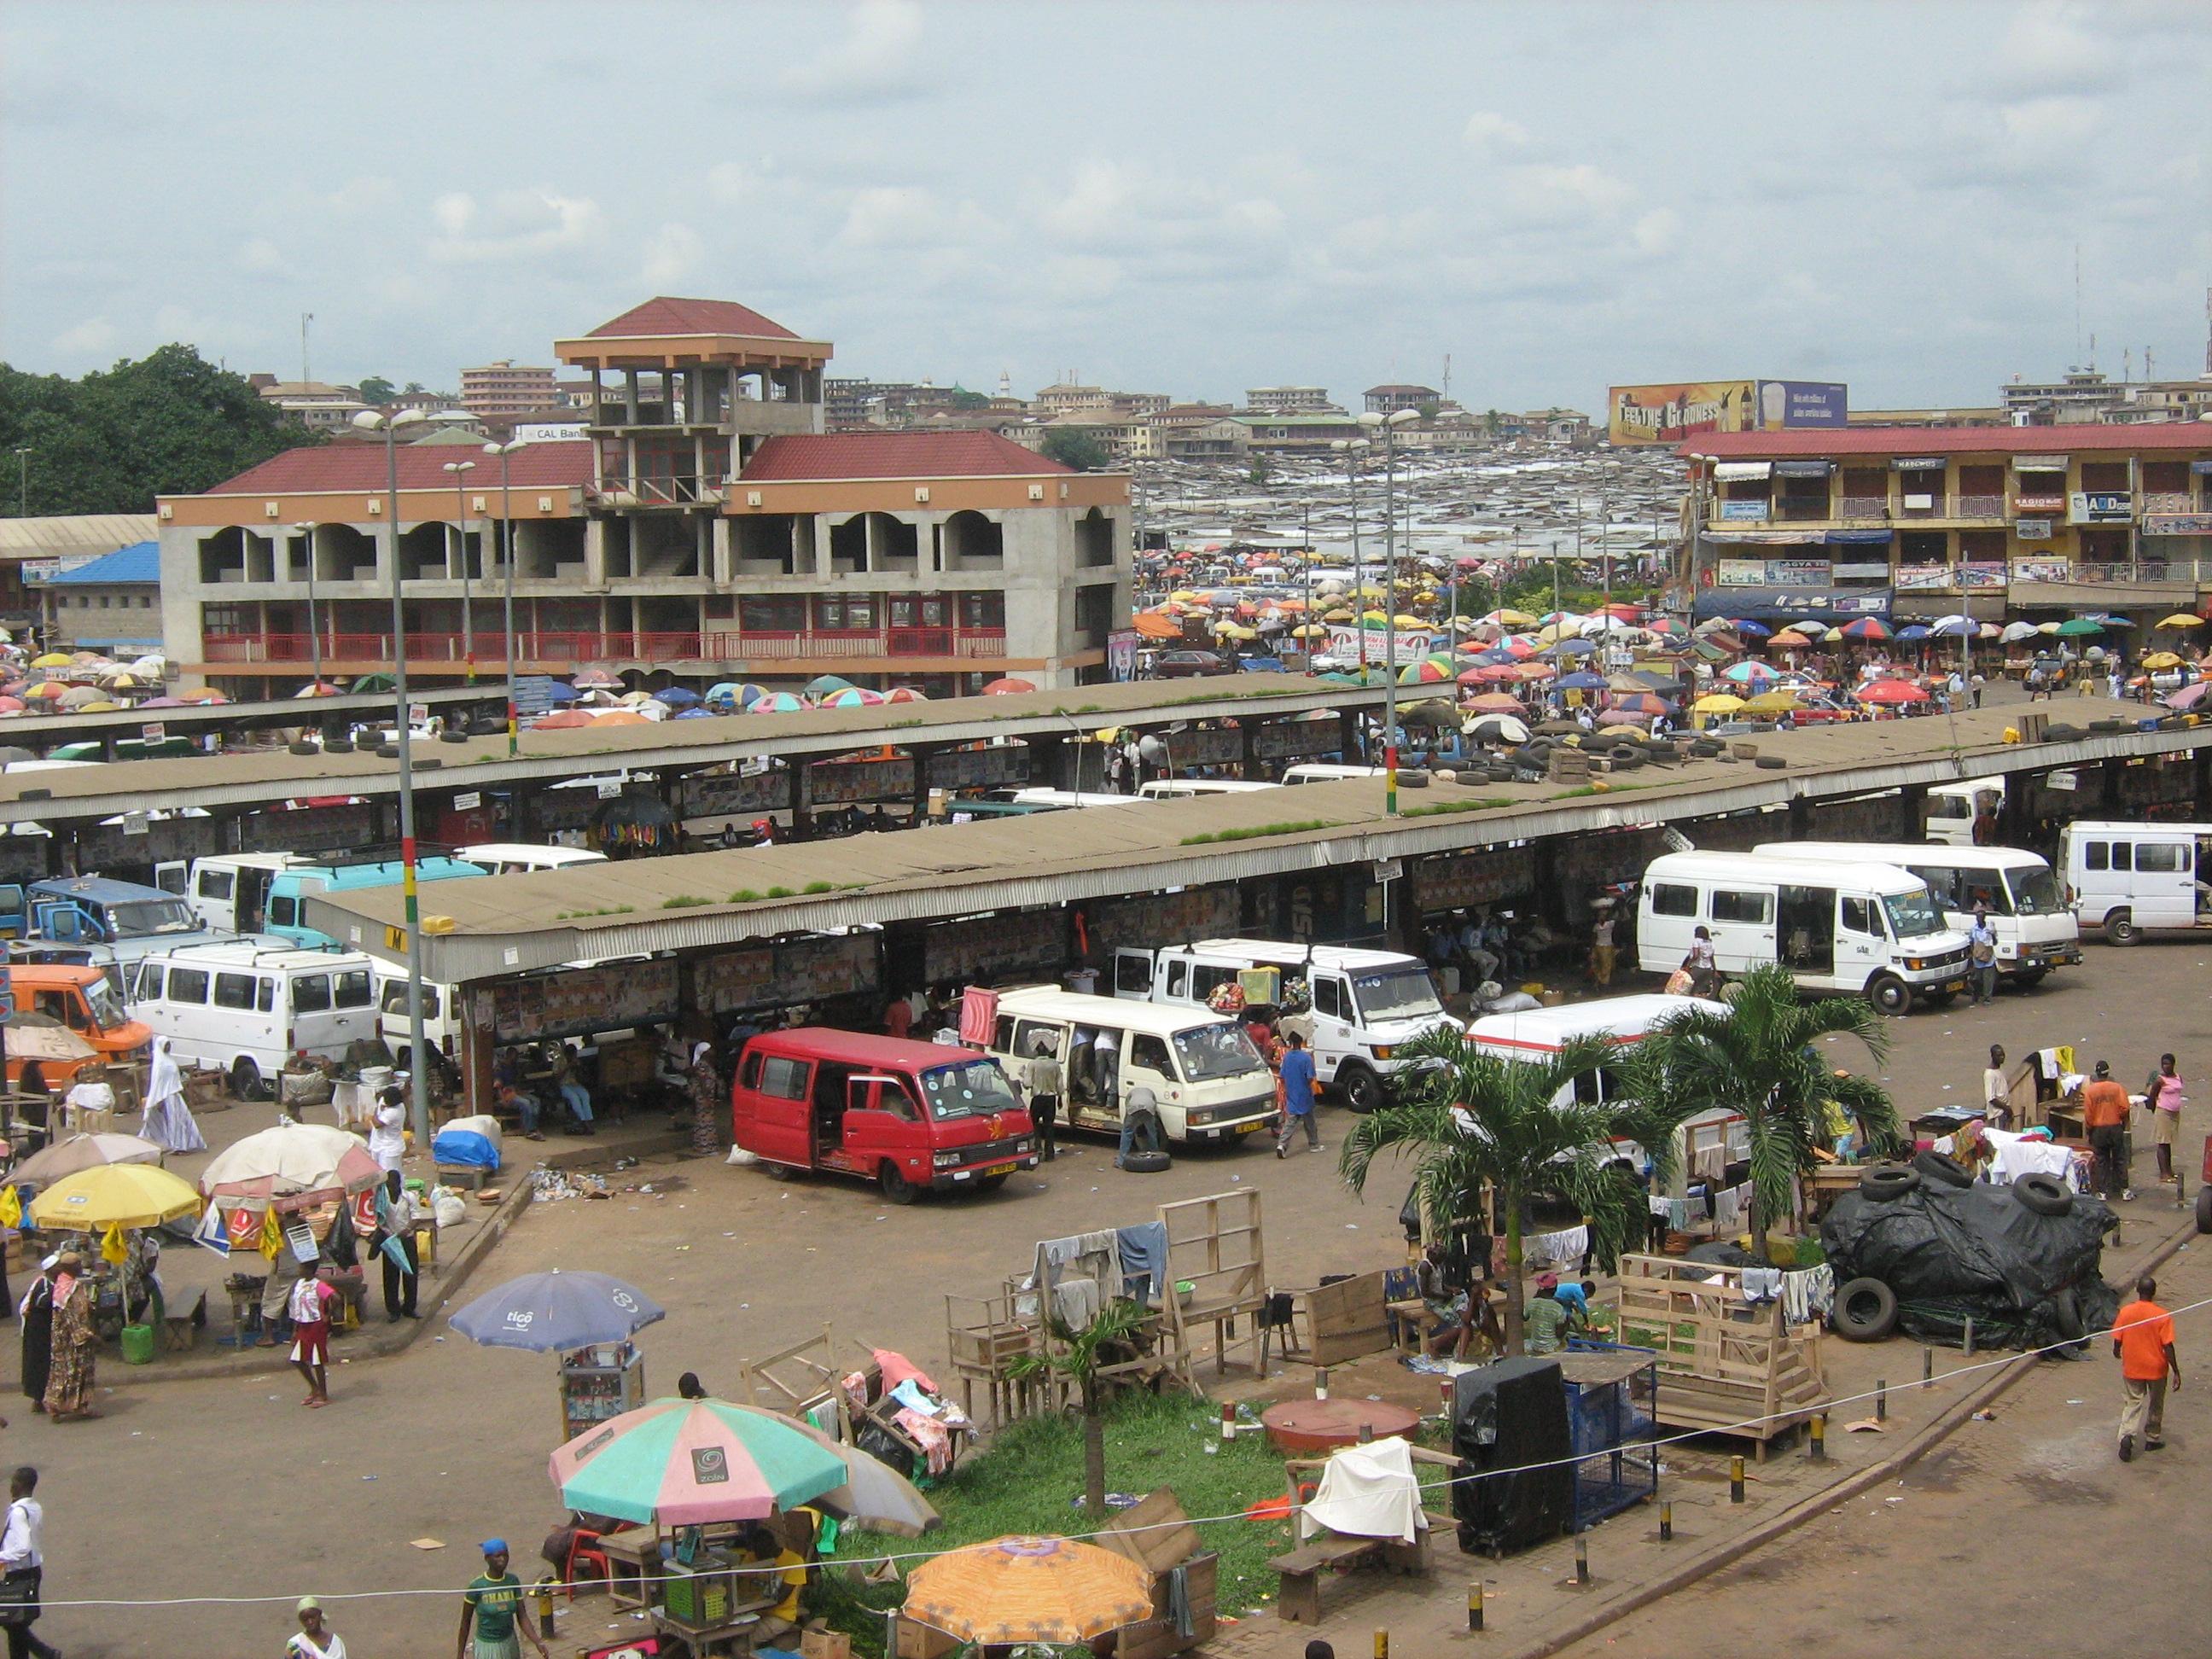 Kumasi Central Station (Ghana)